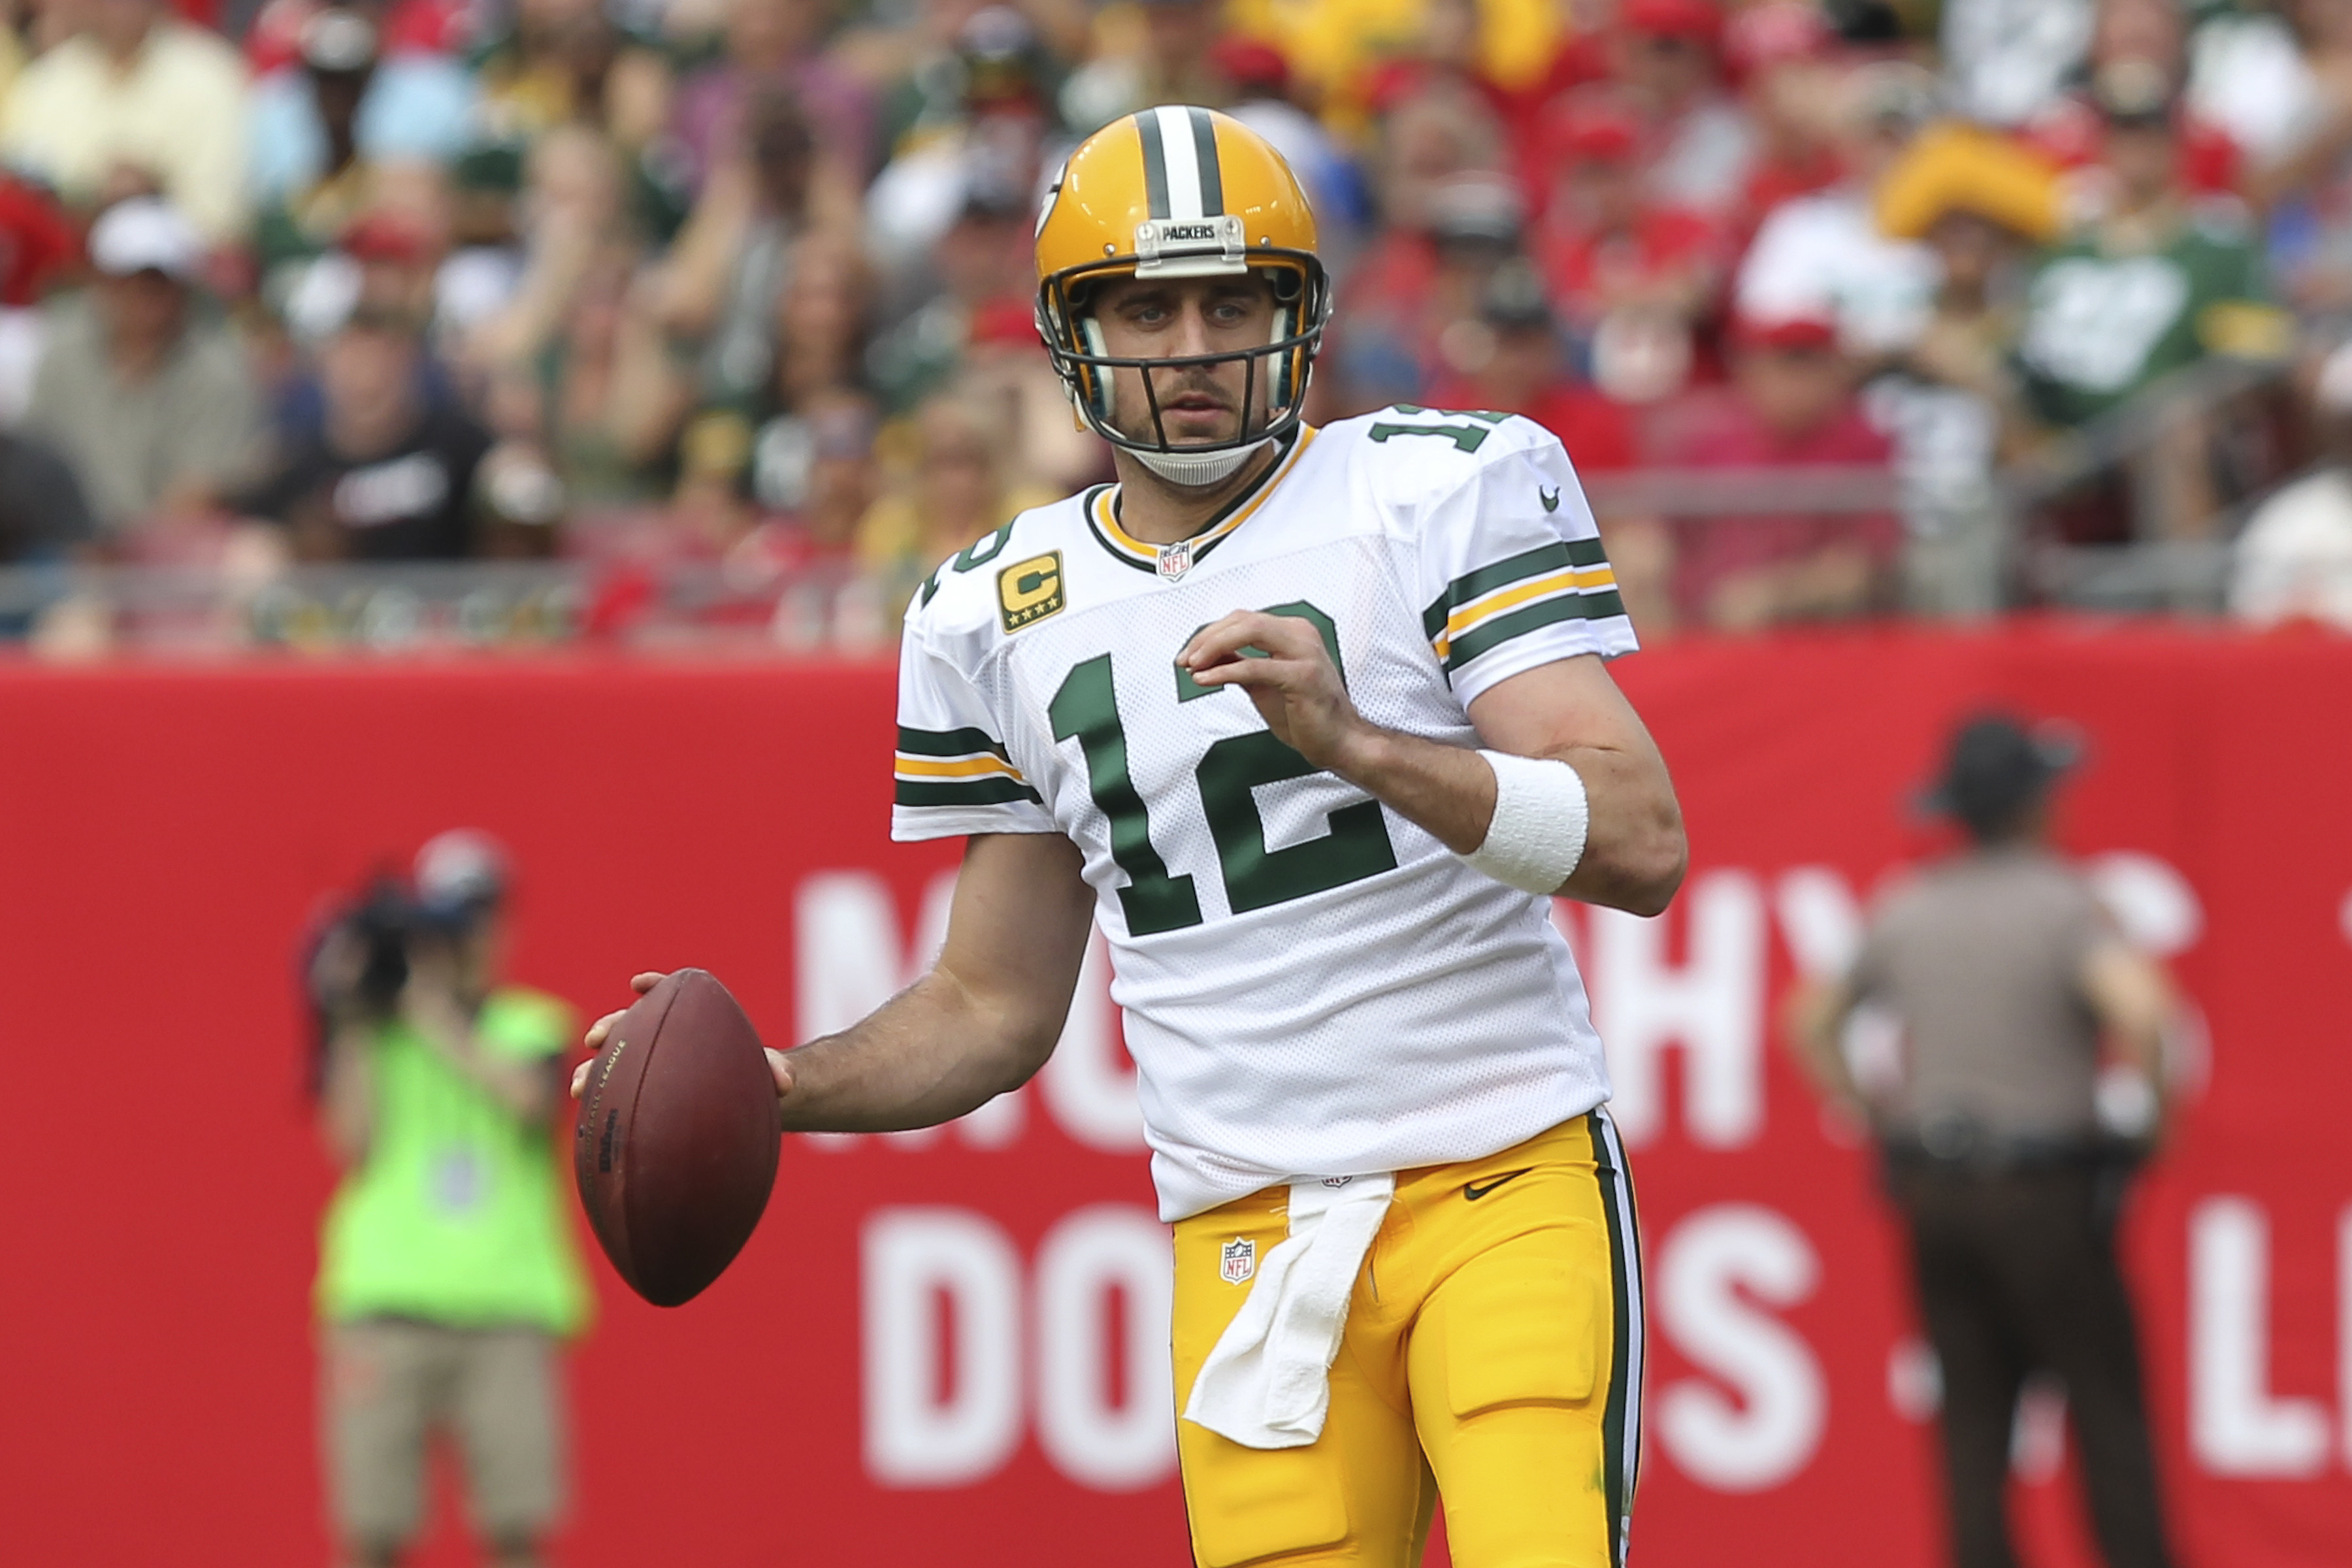 NFL: DEC 21 Packers at Buccaneers